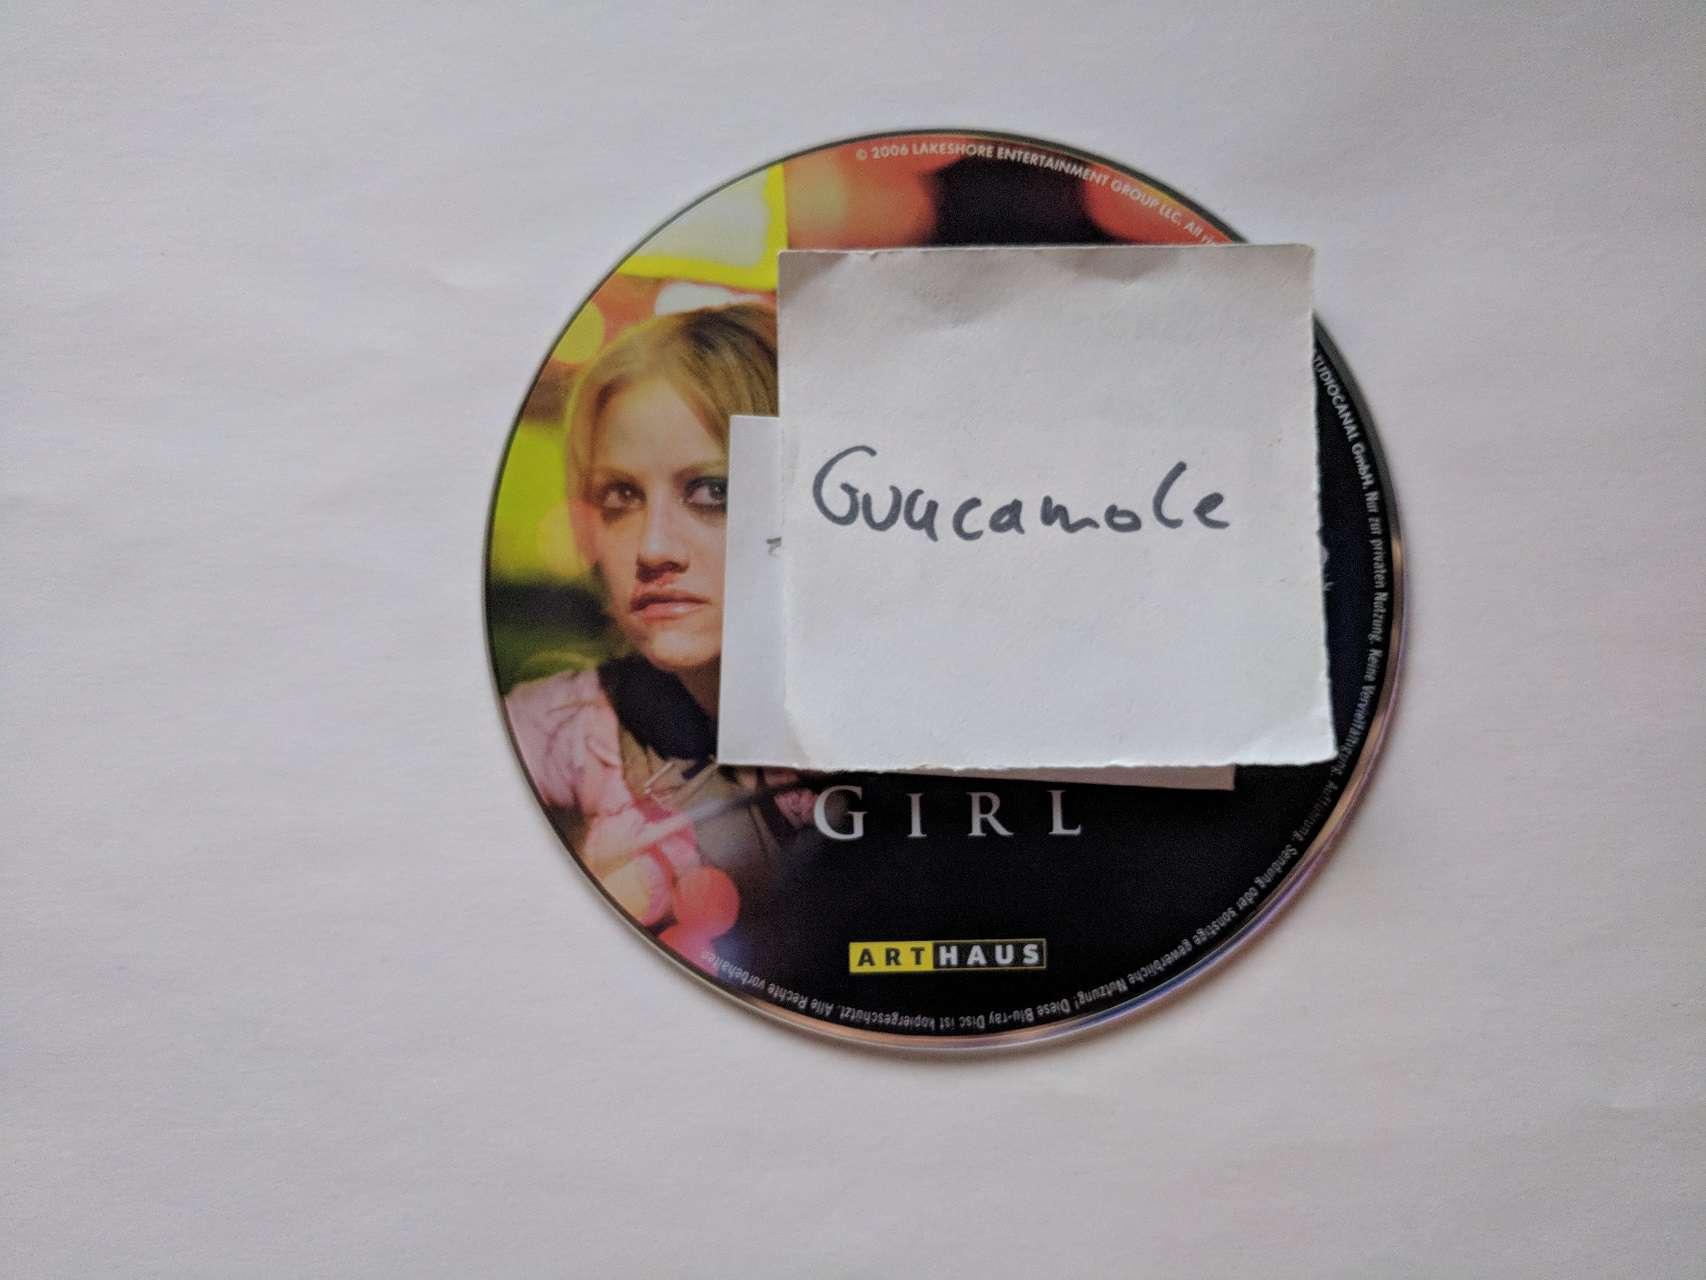 The Dead Girl 2006 720p BluRay x264-GUACAMOLE